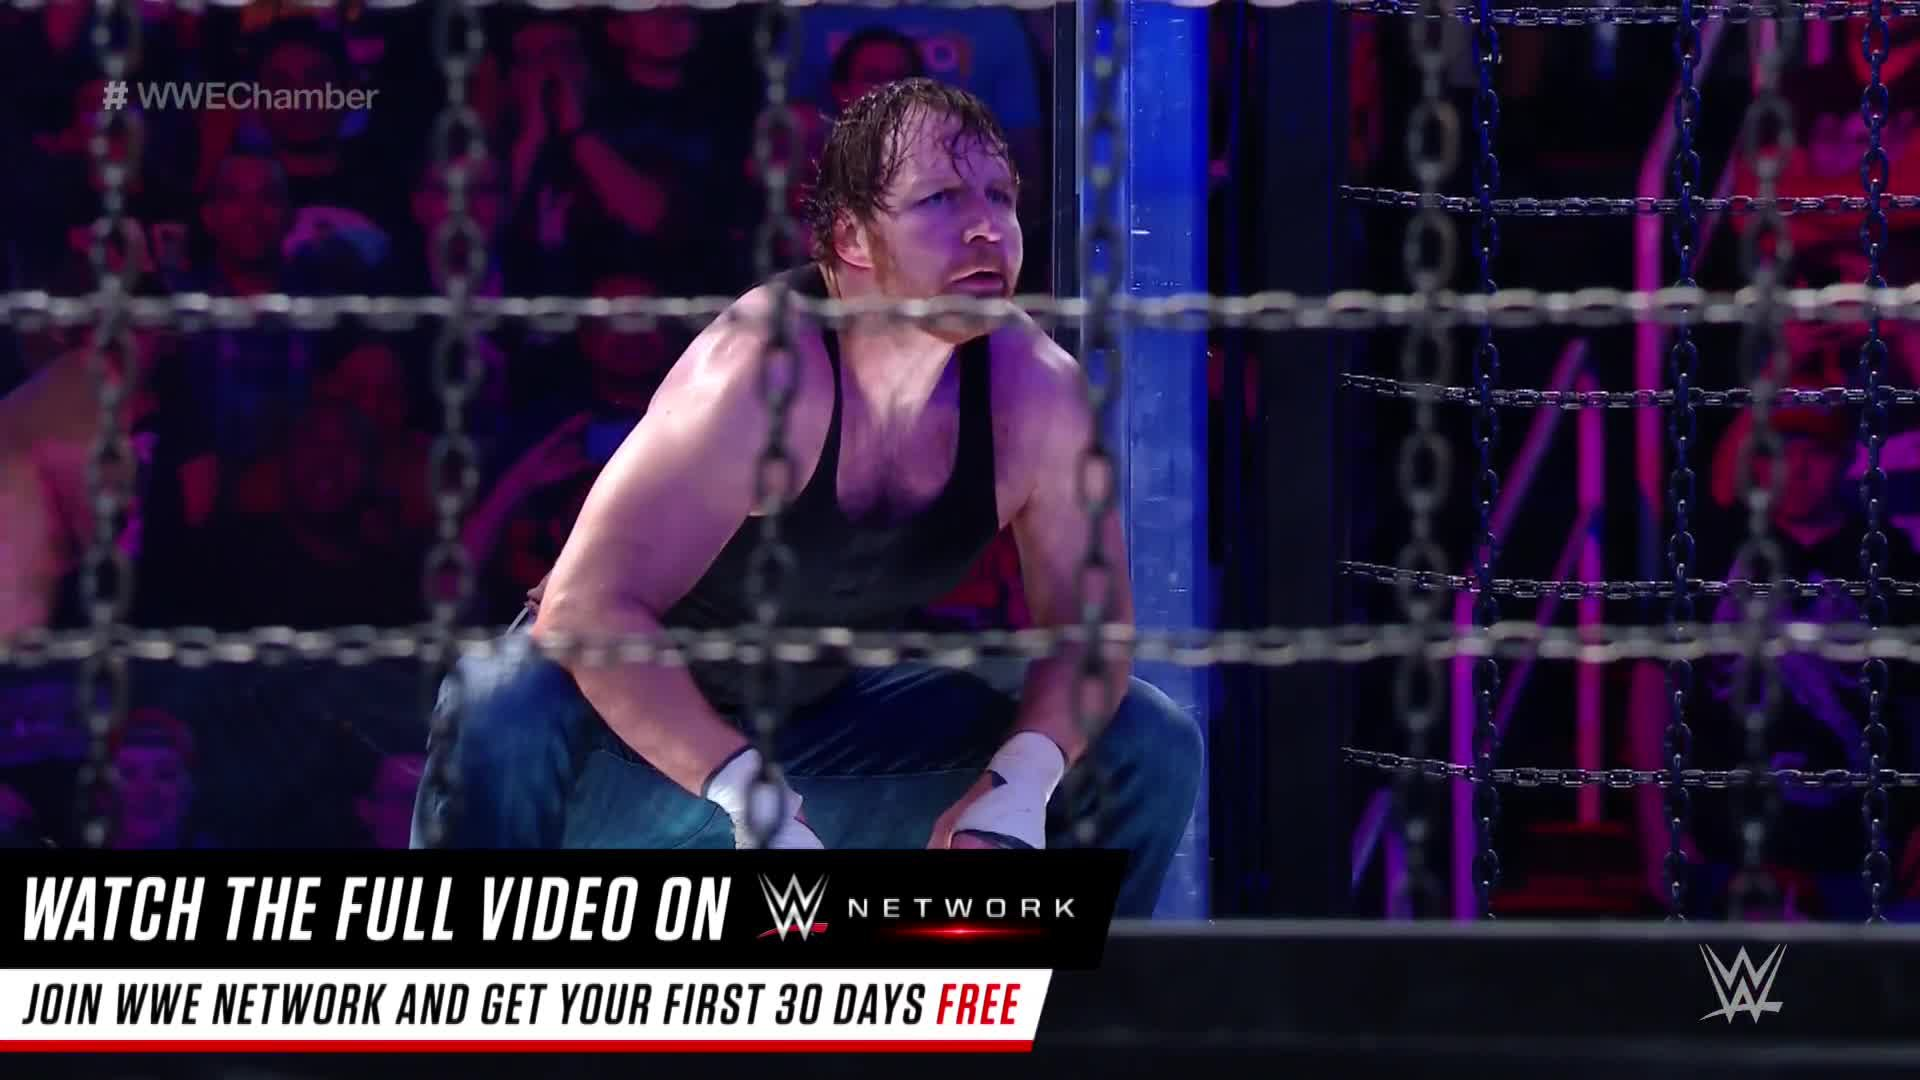 Uczestnicy starcia o WWE Title na Elimination Chamber zbierają się: Elimination Chamber 2017 (WWE Network Exclusive)